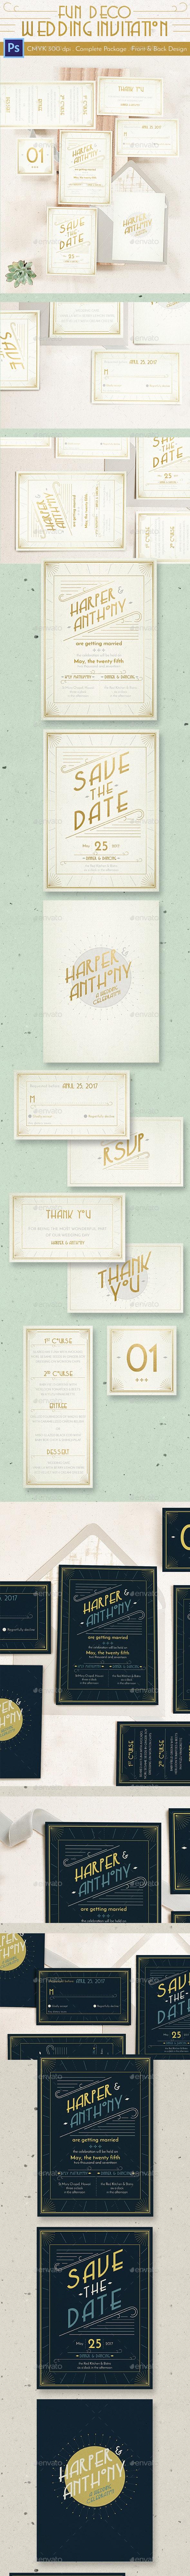 Fun Deco Wedding Invitation - Cards & Invites Print Templates